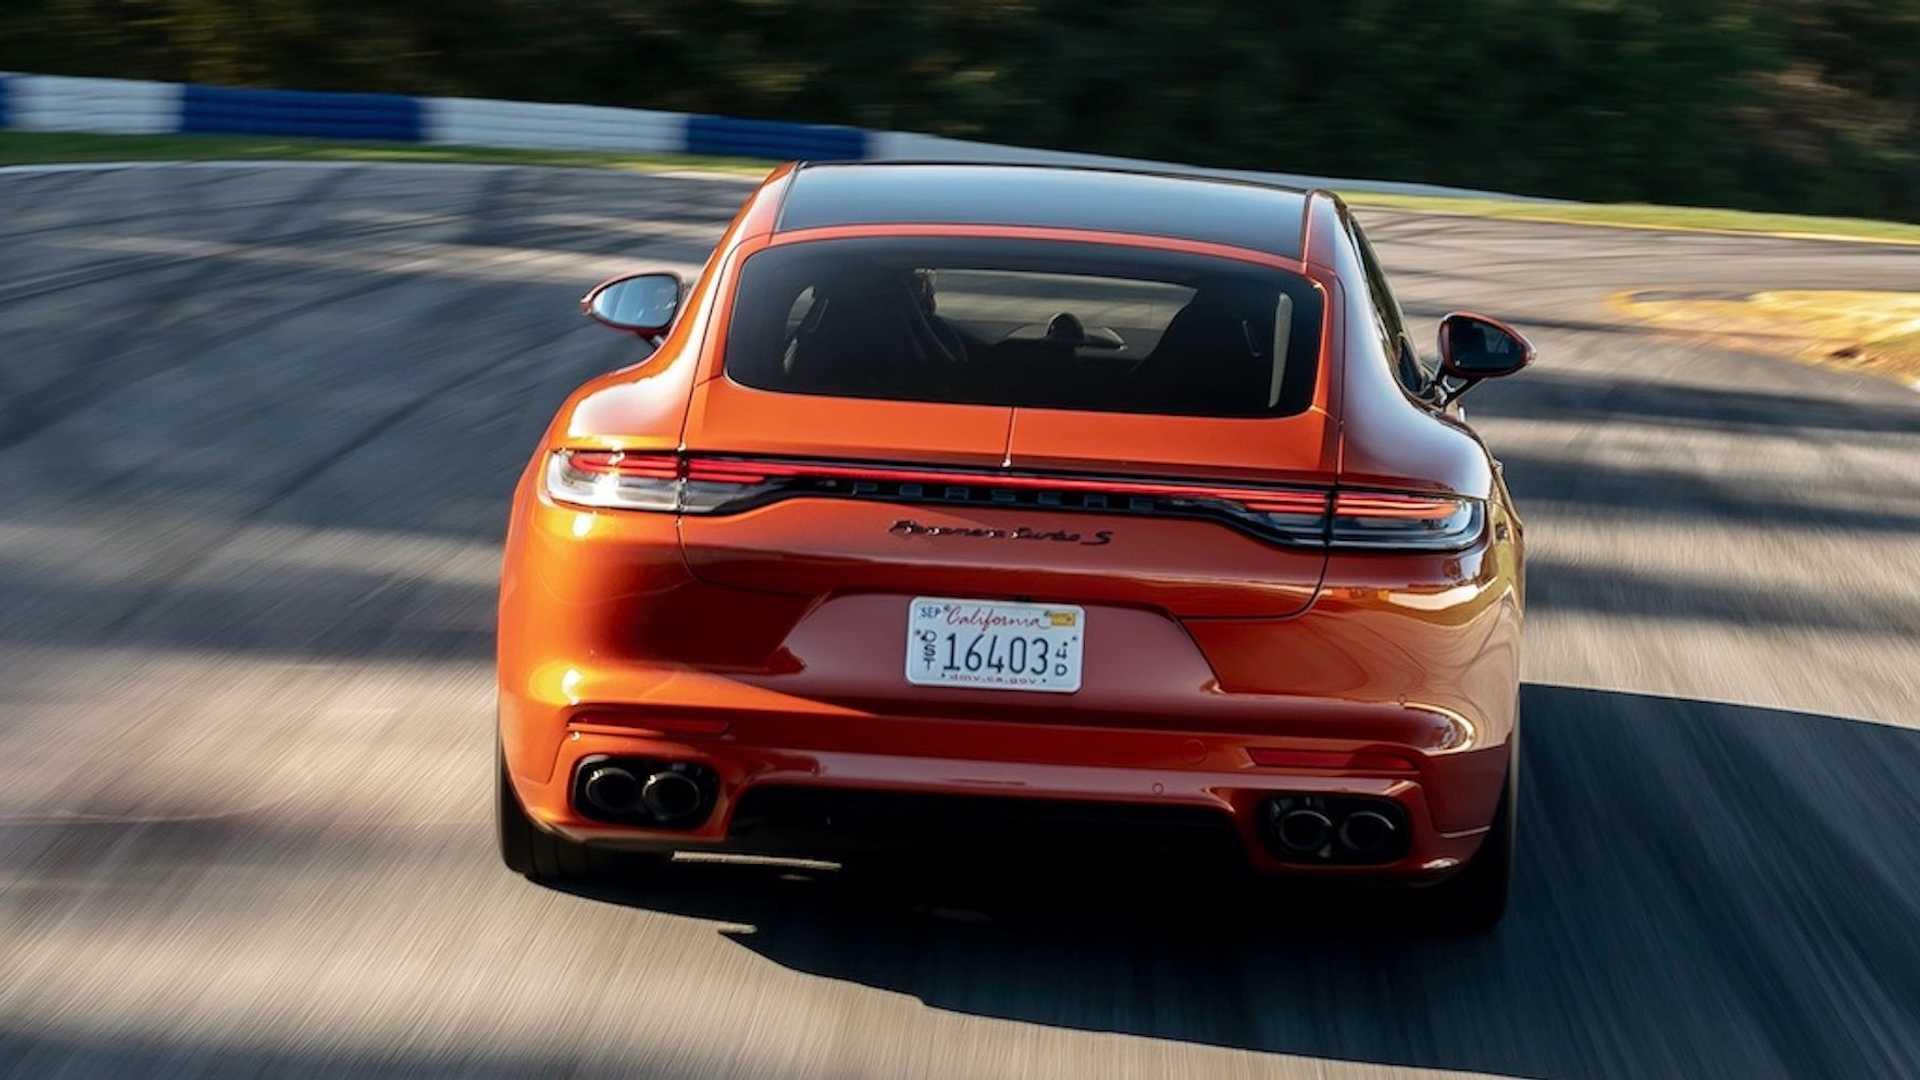 Porsche-Panamera-Turbo-Record-Road-Atlanta-13